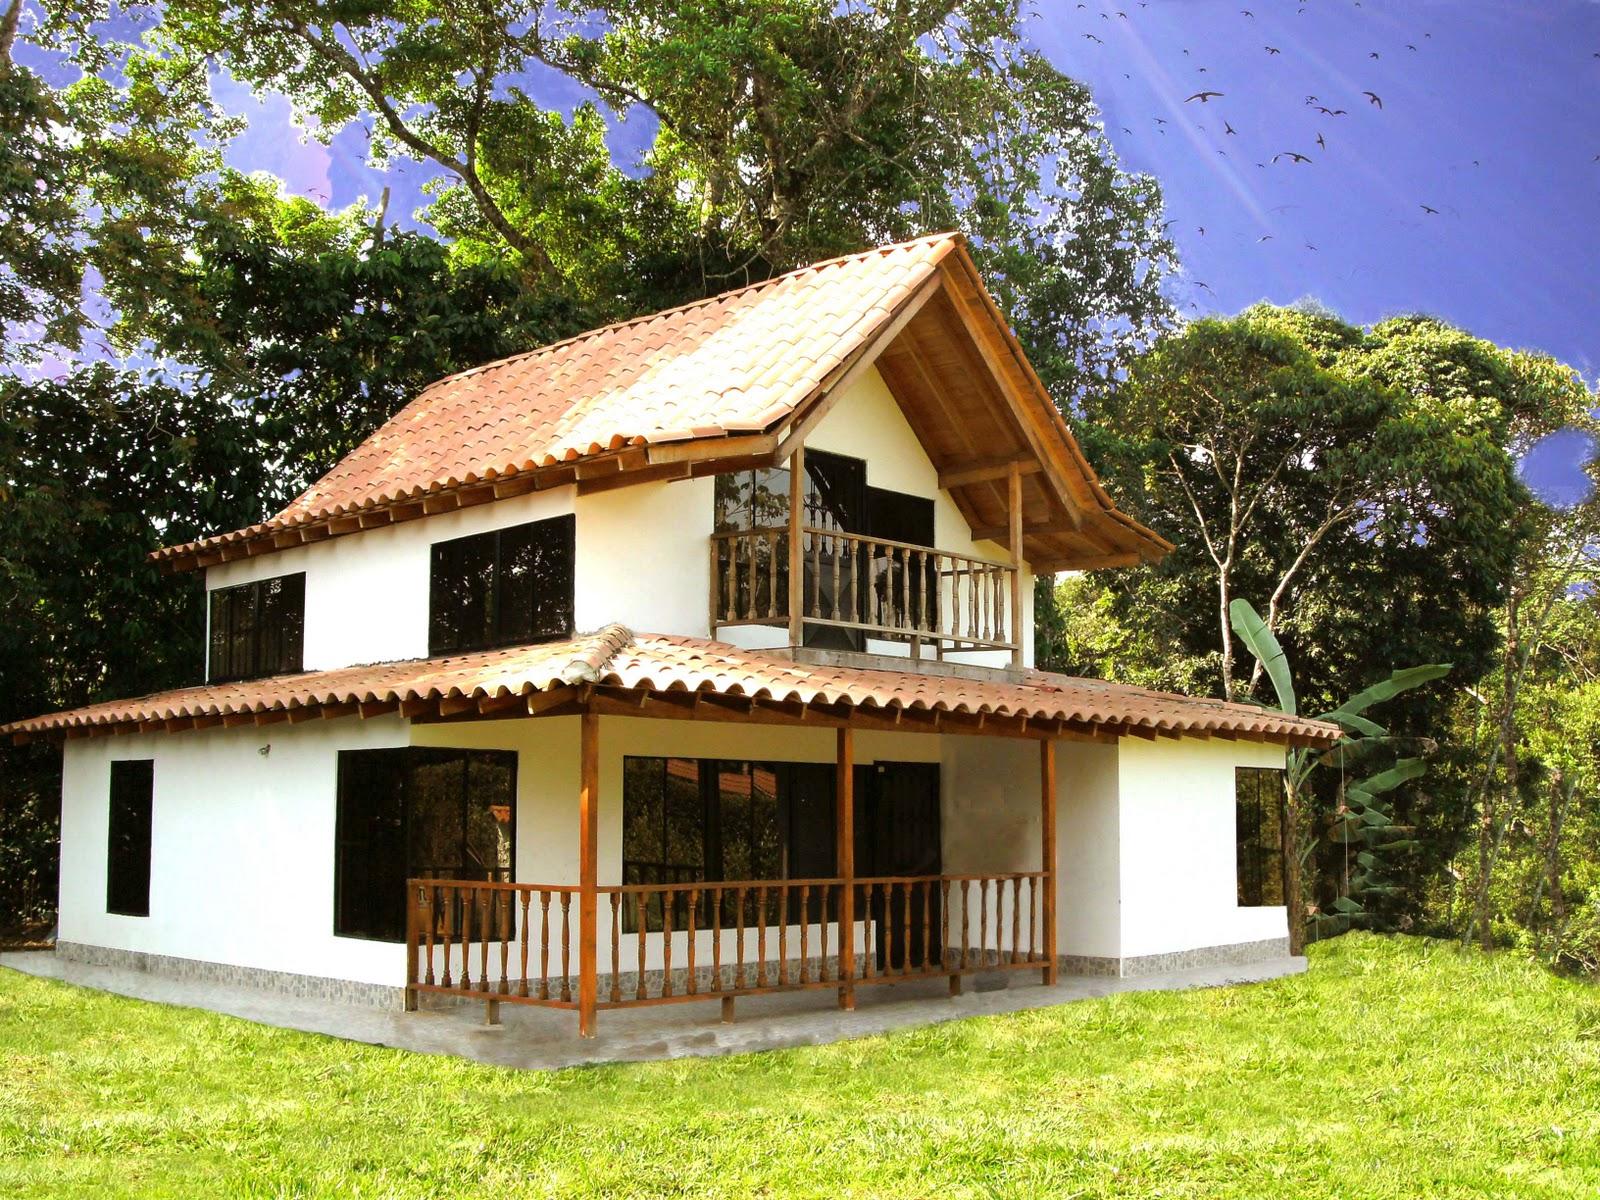 Casas de madera prefabricadas mejores casas prefabricadas - Casa de madera prefabricadas ...